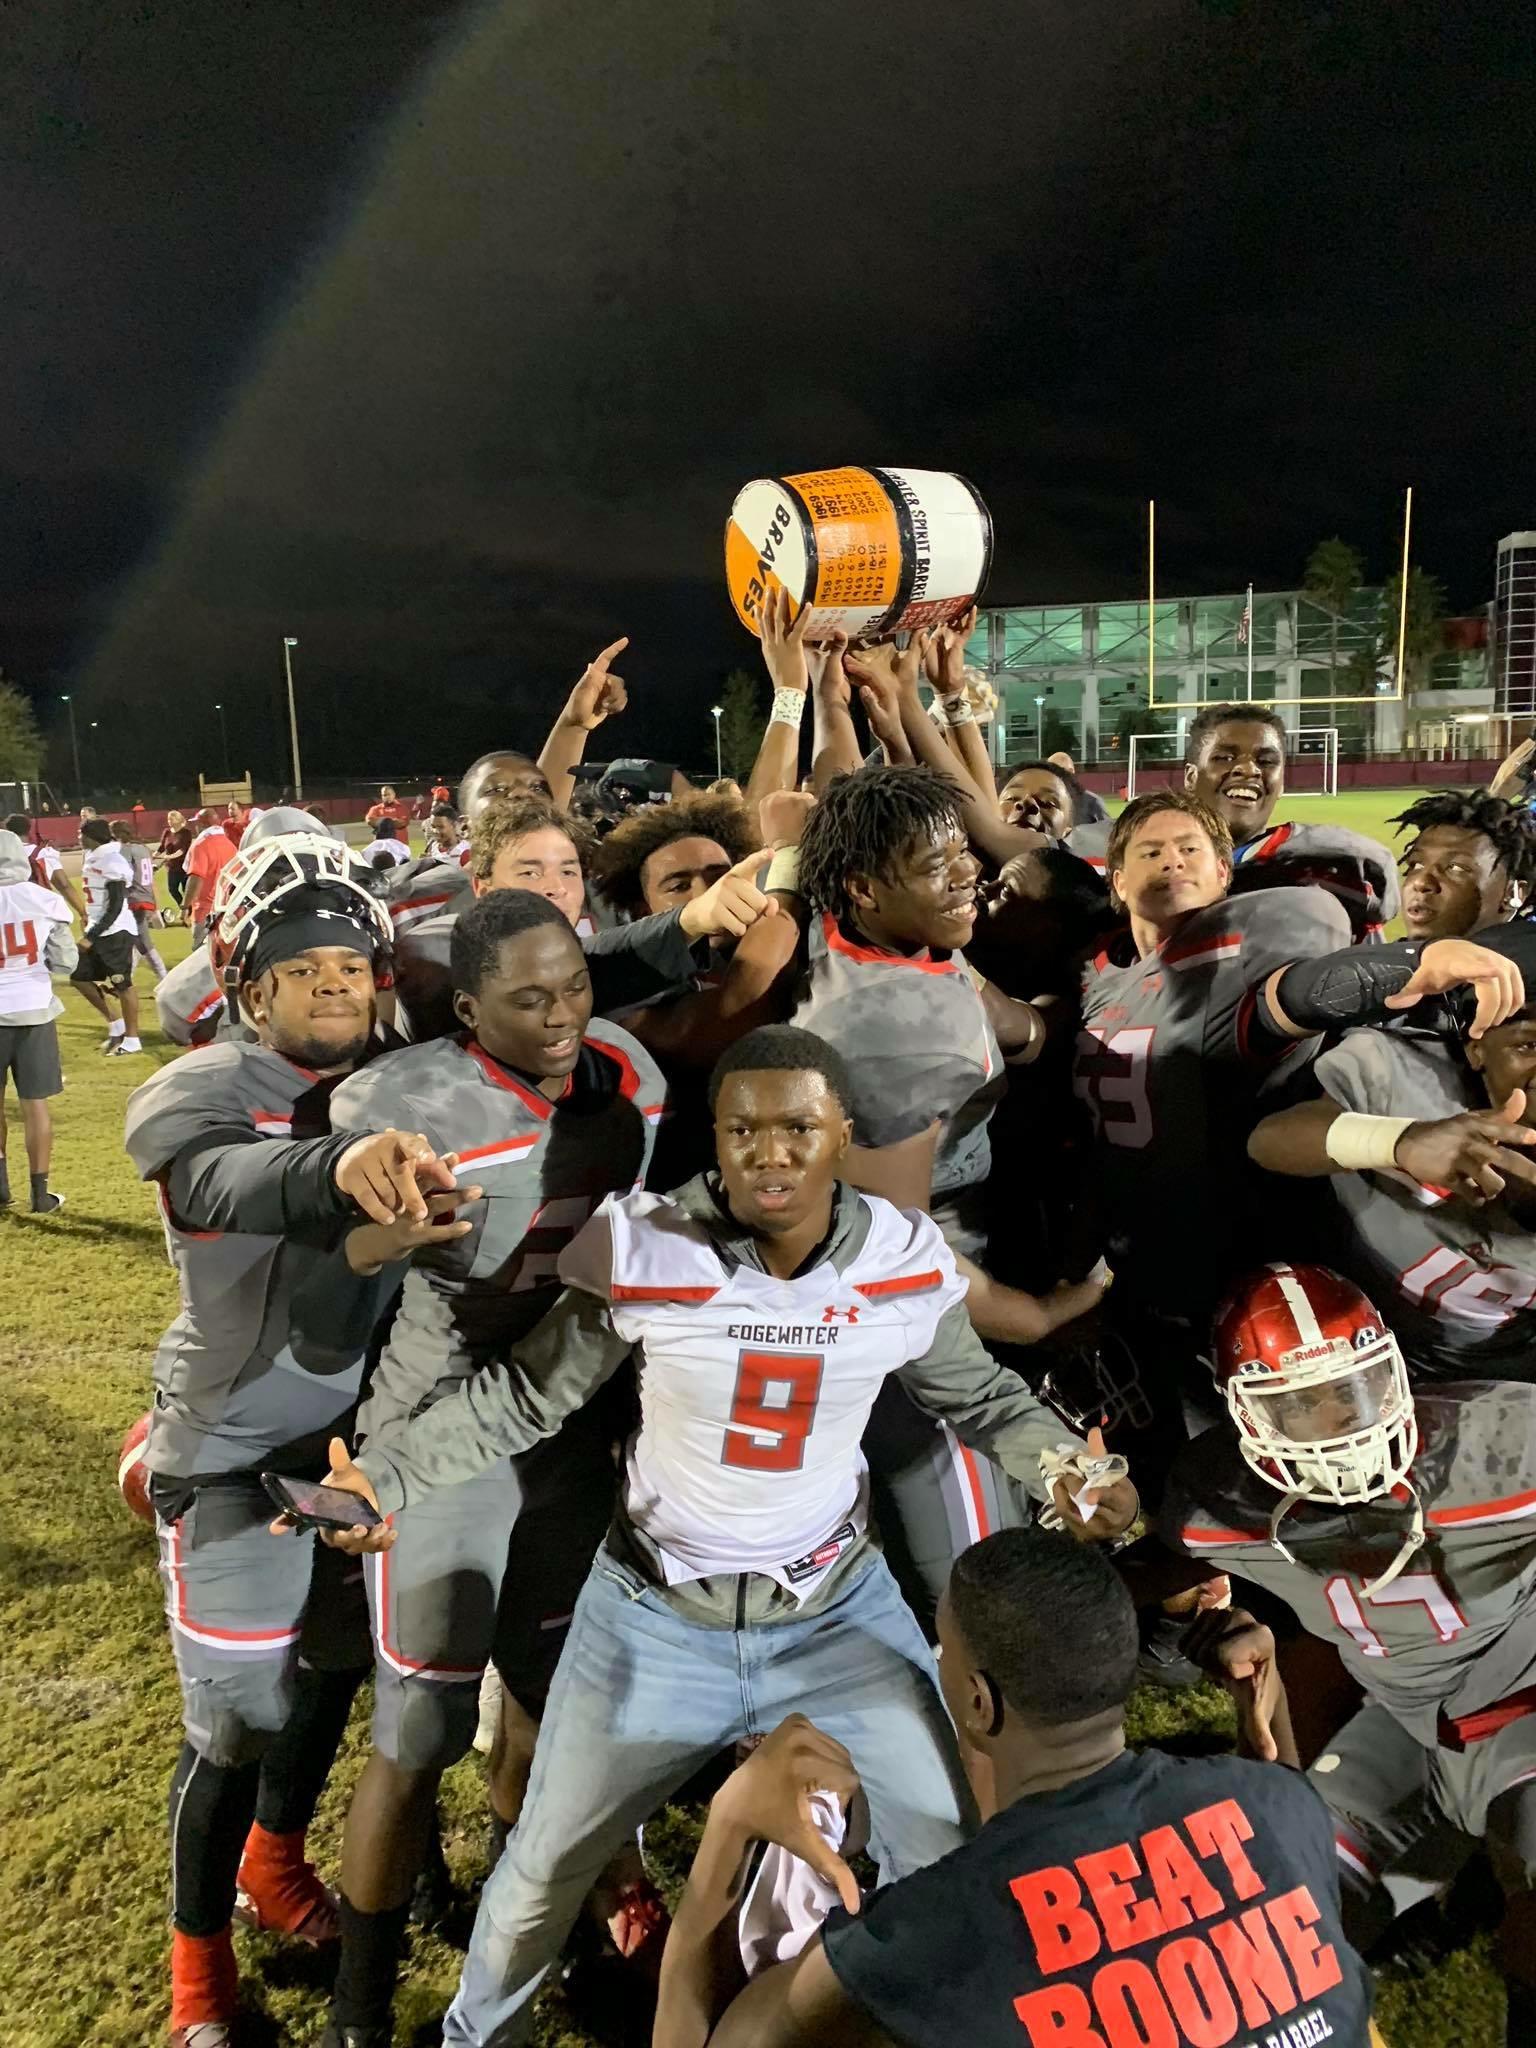 Edgewater High School Football Team Reflects On Winning 2018 Season